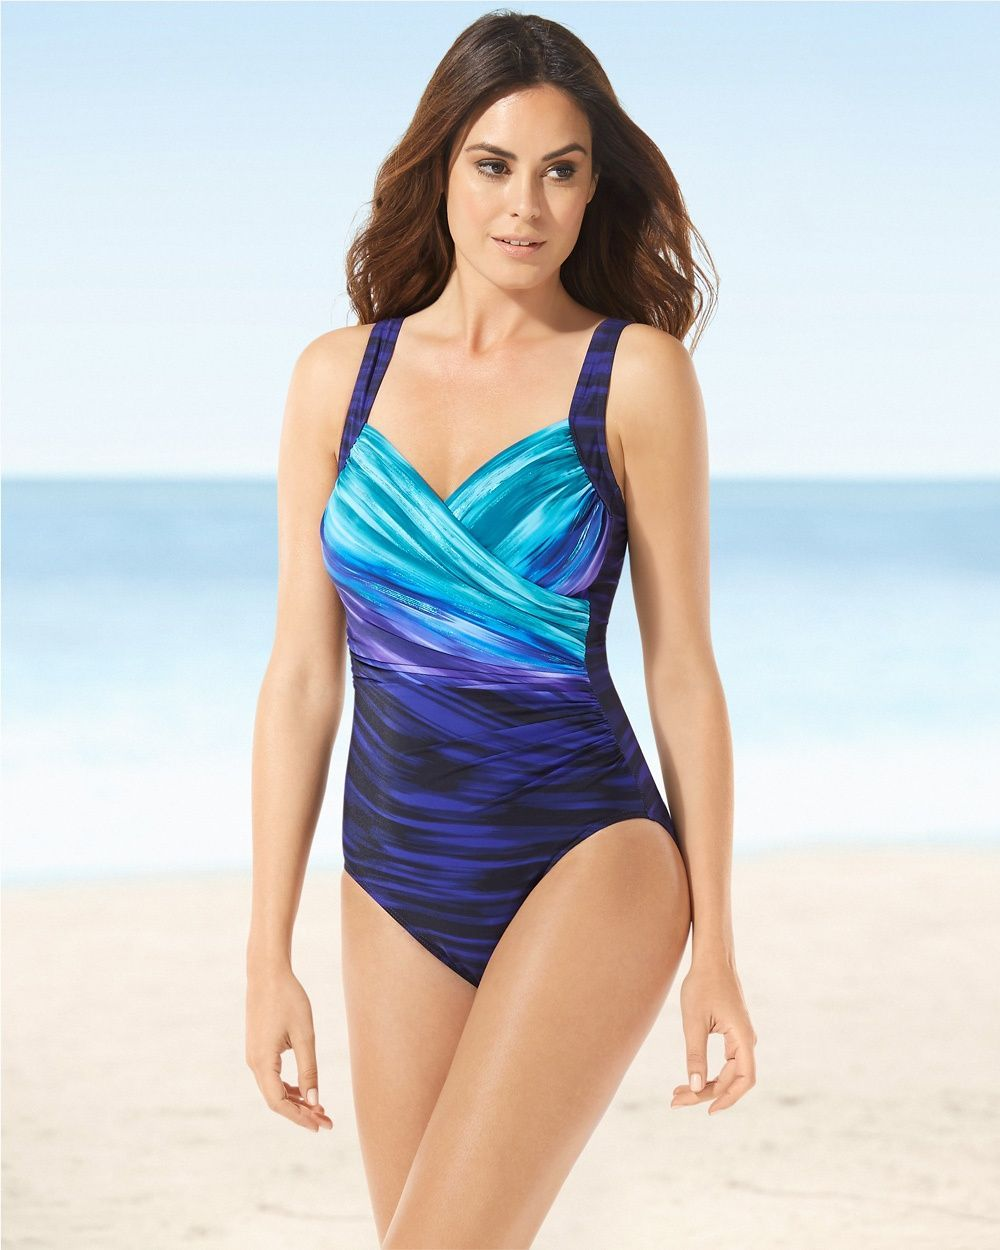 c67fb6fcd22 Soma Miraclesuit Sanibel One Piece Swimsuit, Size: 12, Eggplant ...